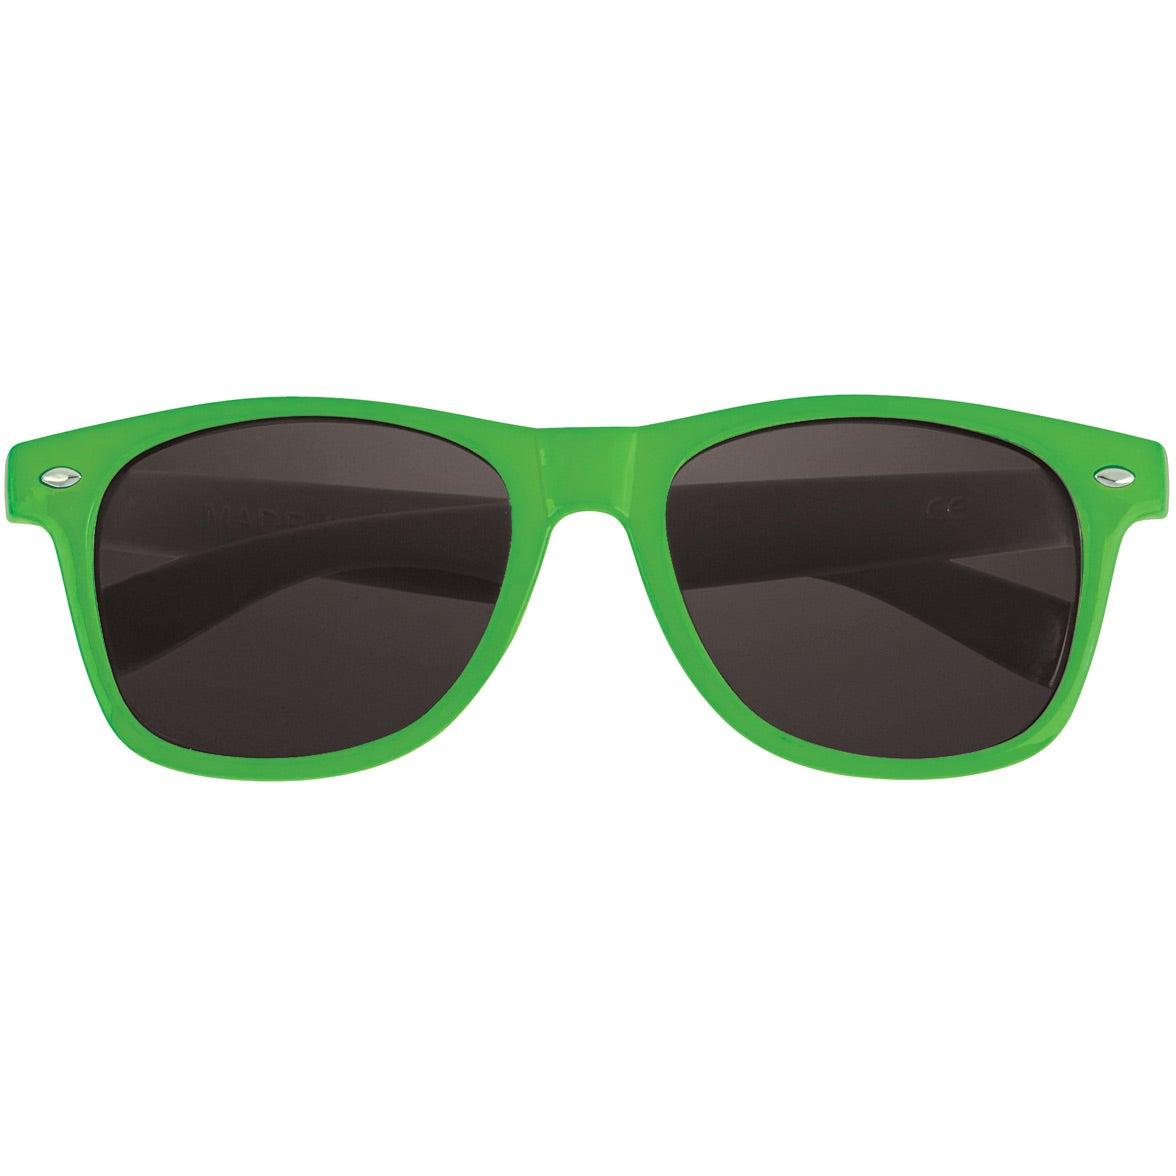 color lens glasses custom sunglasses 3 67 ea